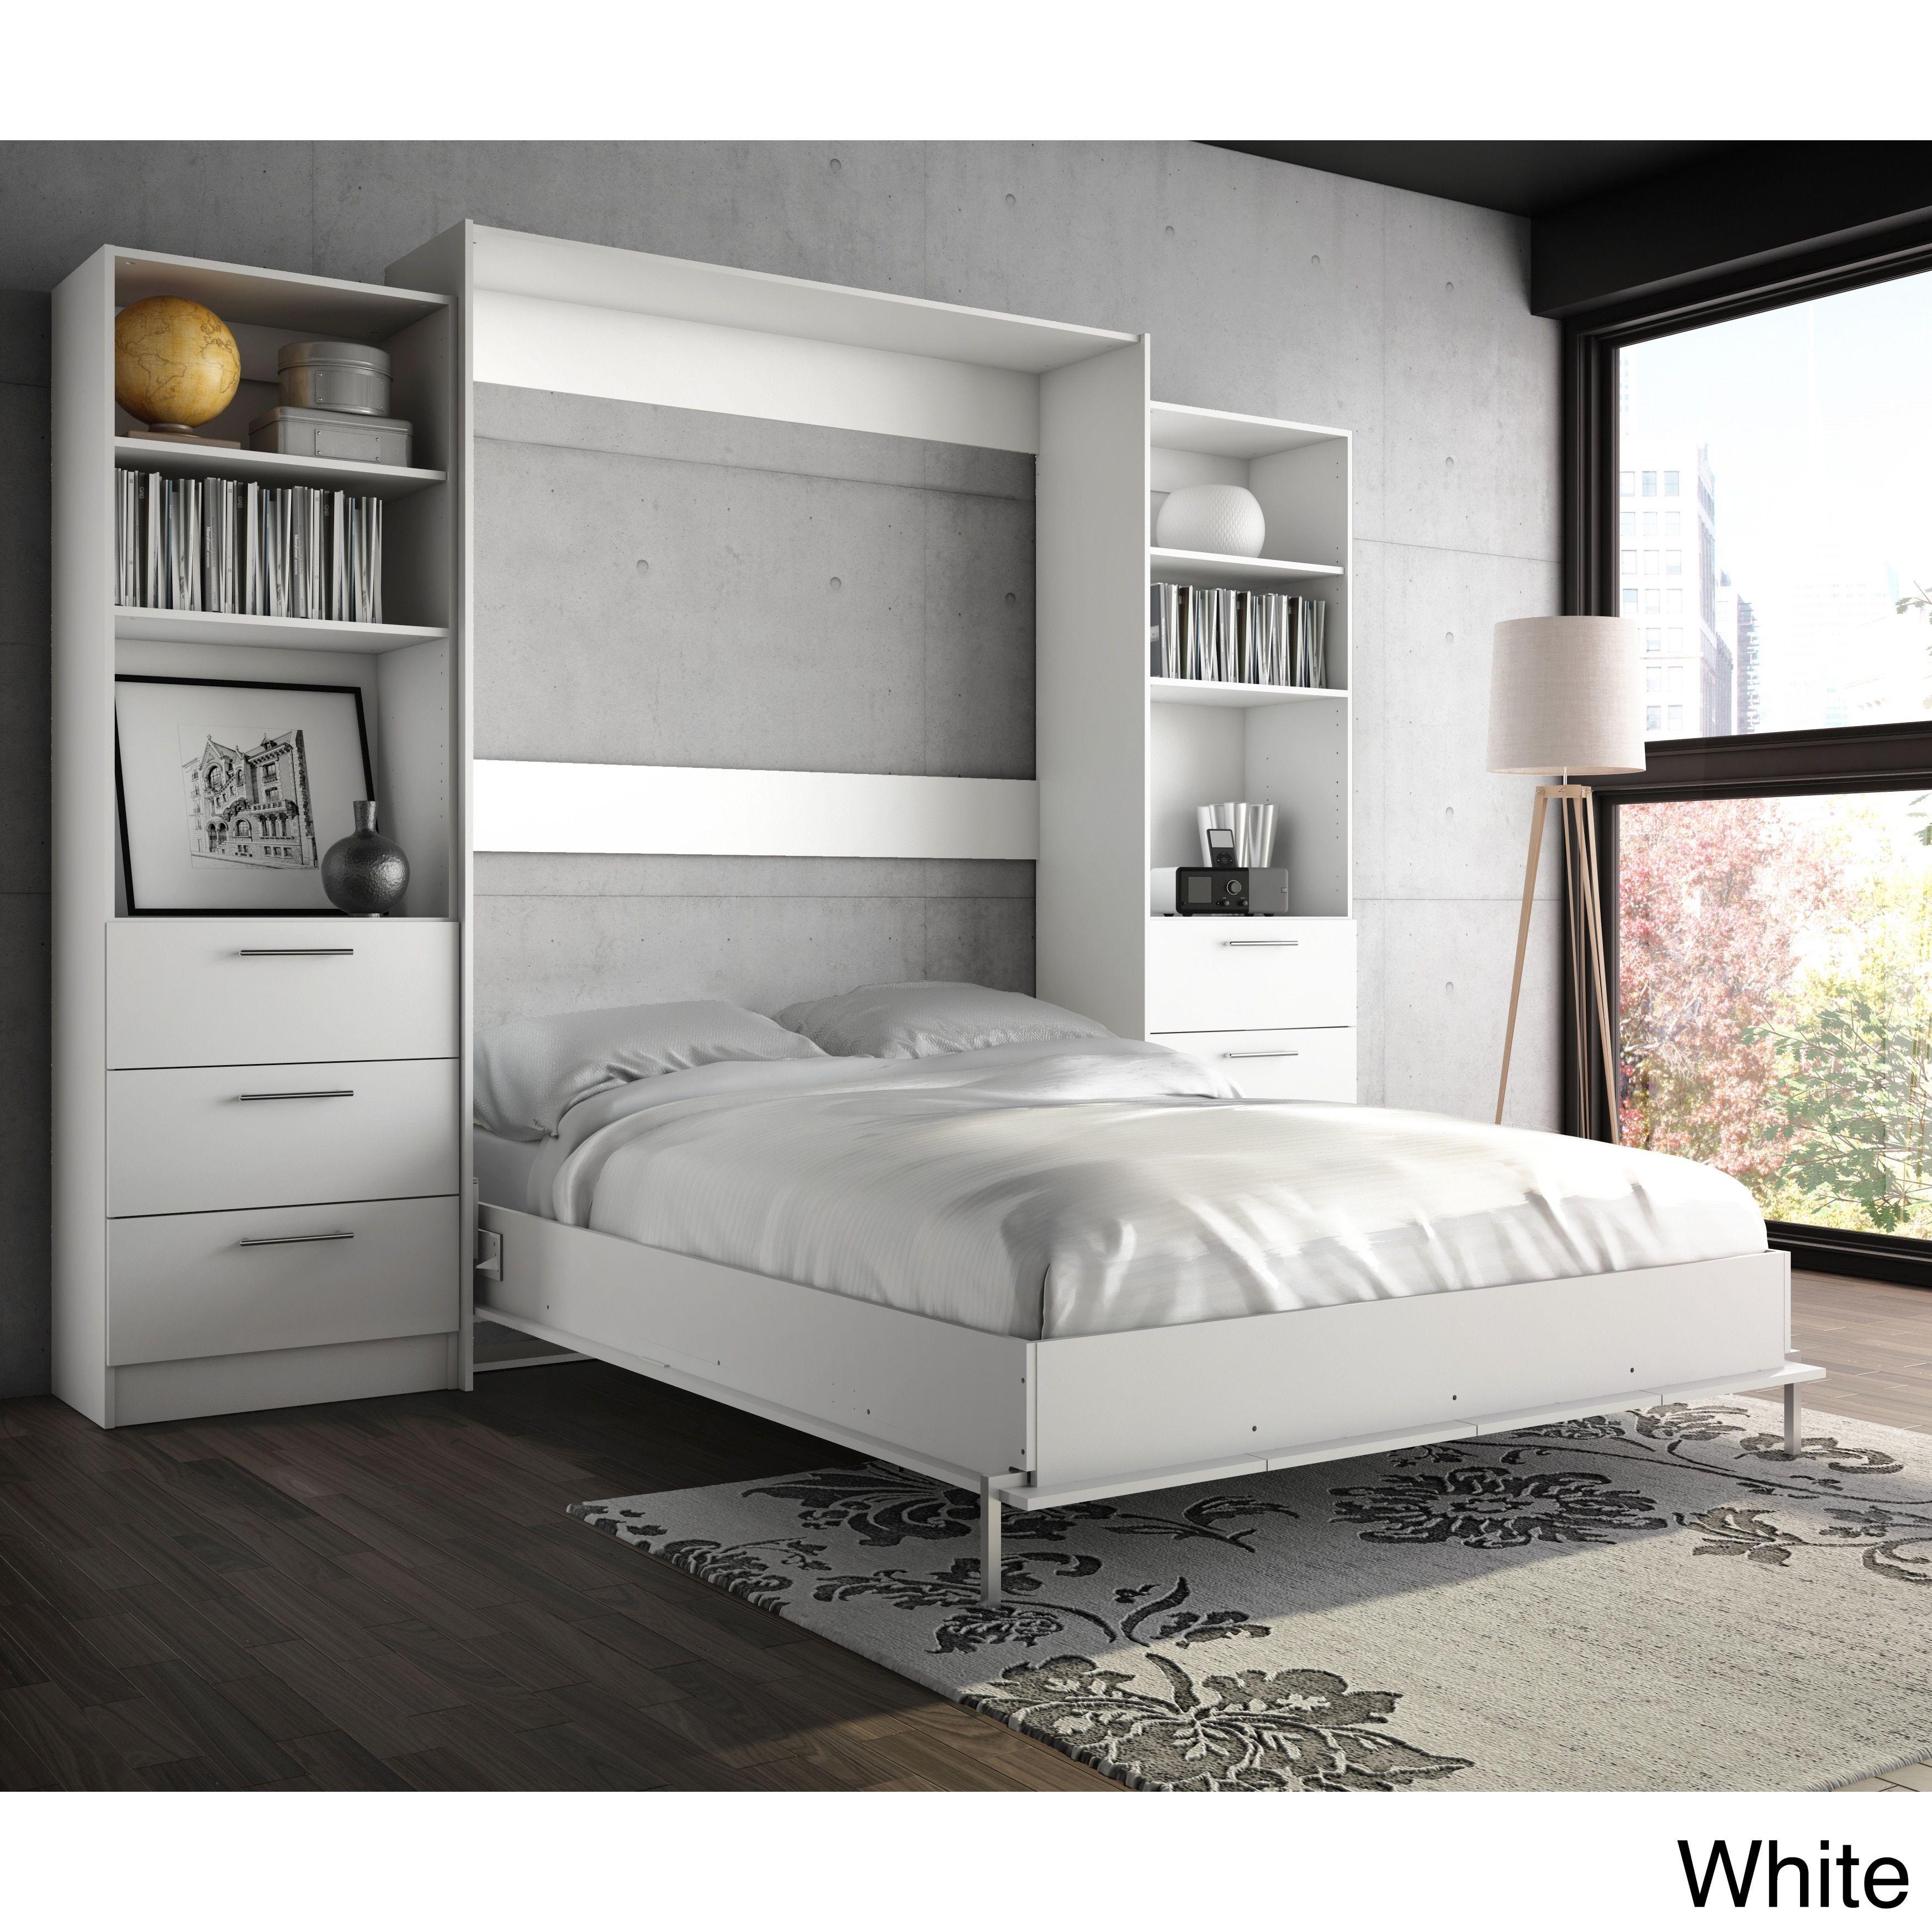 Stellar Home Furniture Full Wall Bed Modern Murphy Beds Murphy Bed Plans Bed Wall